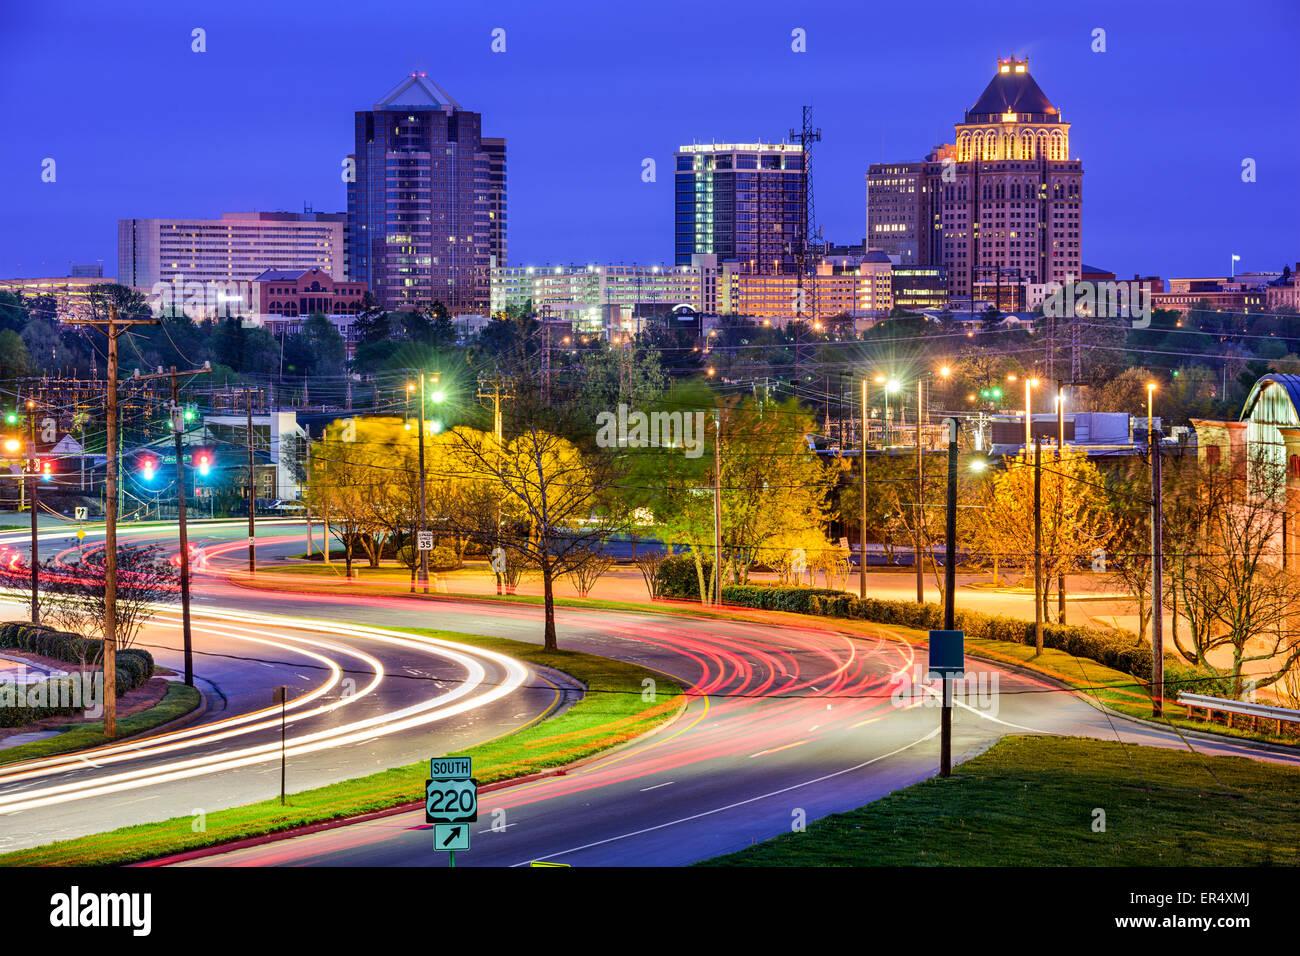 Greensboro, North Carolina, USA Skyline der Innenstadt. Stockfoto